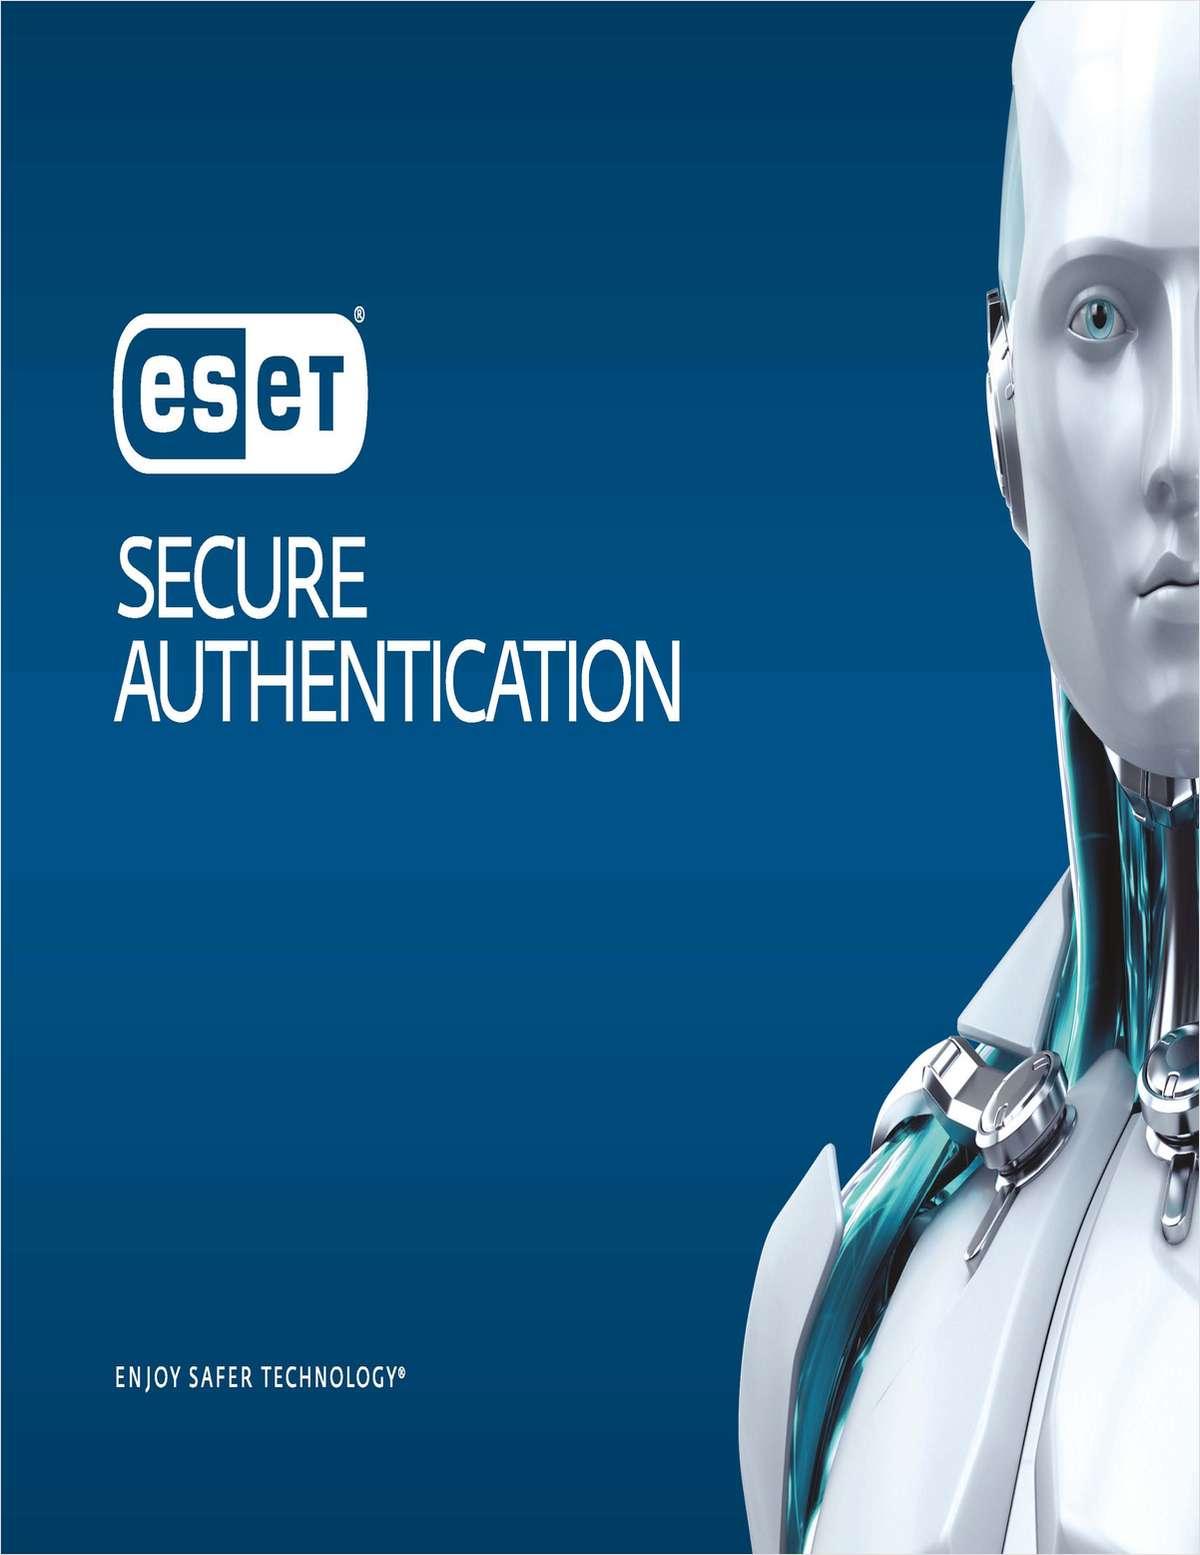 ESET Secure Authentication Solution Overview